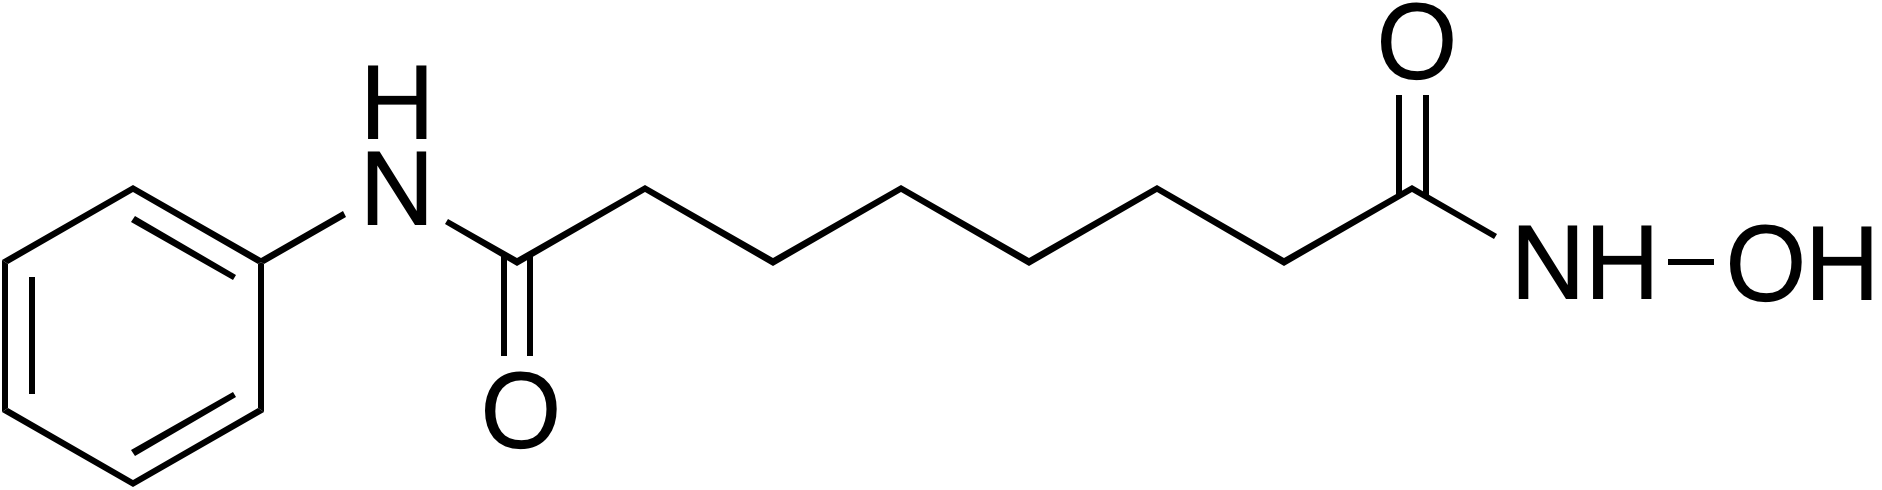 Suberoylanilide hydroxamic acid (SAHA)